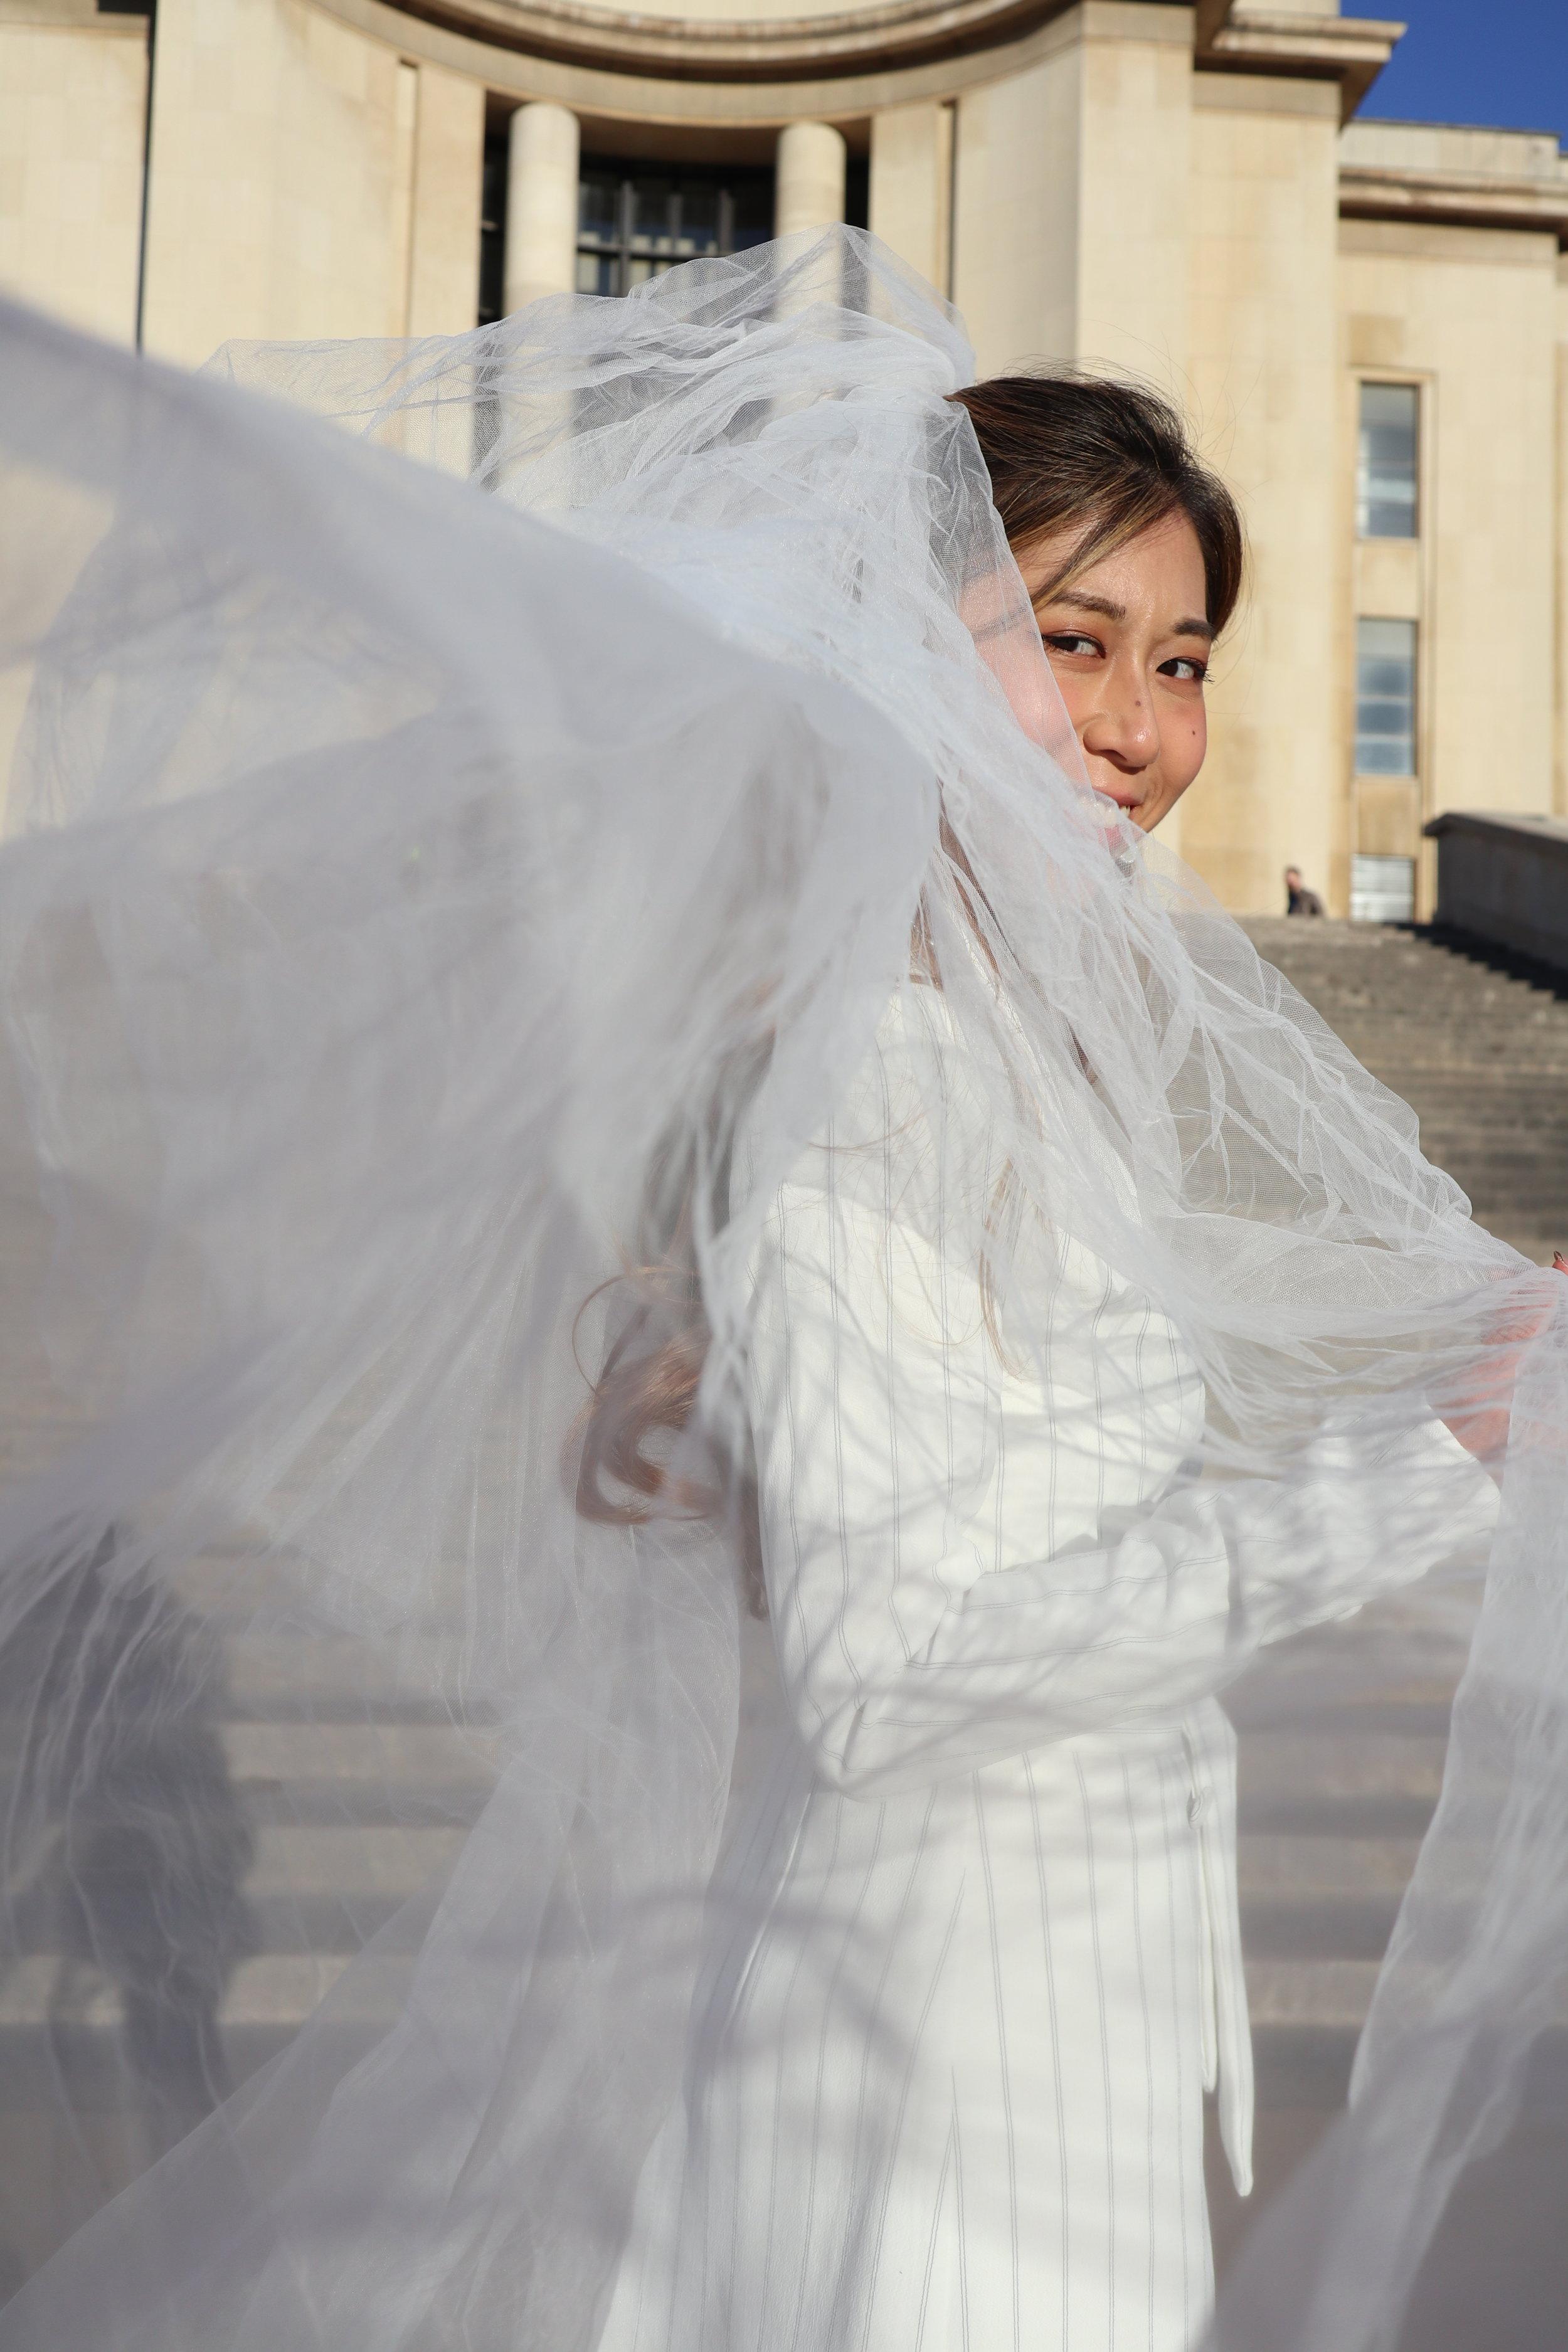 - Veil: CASPIA LILI Iris veil